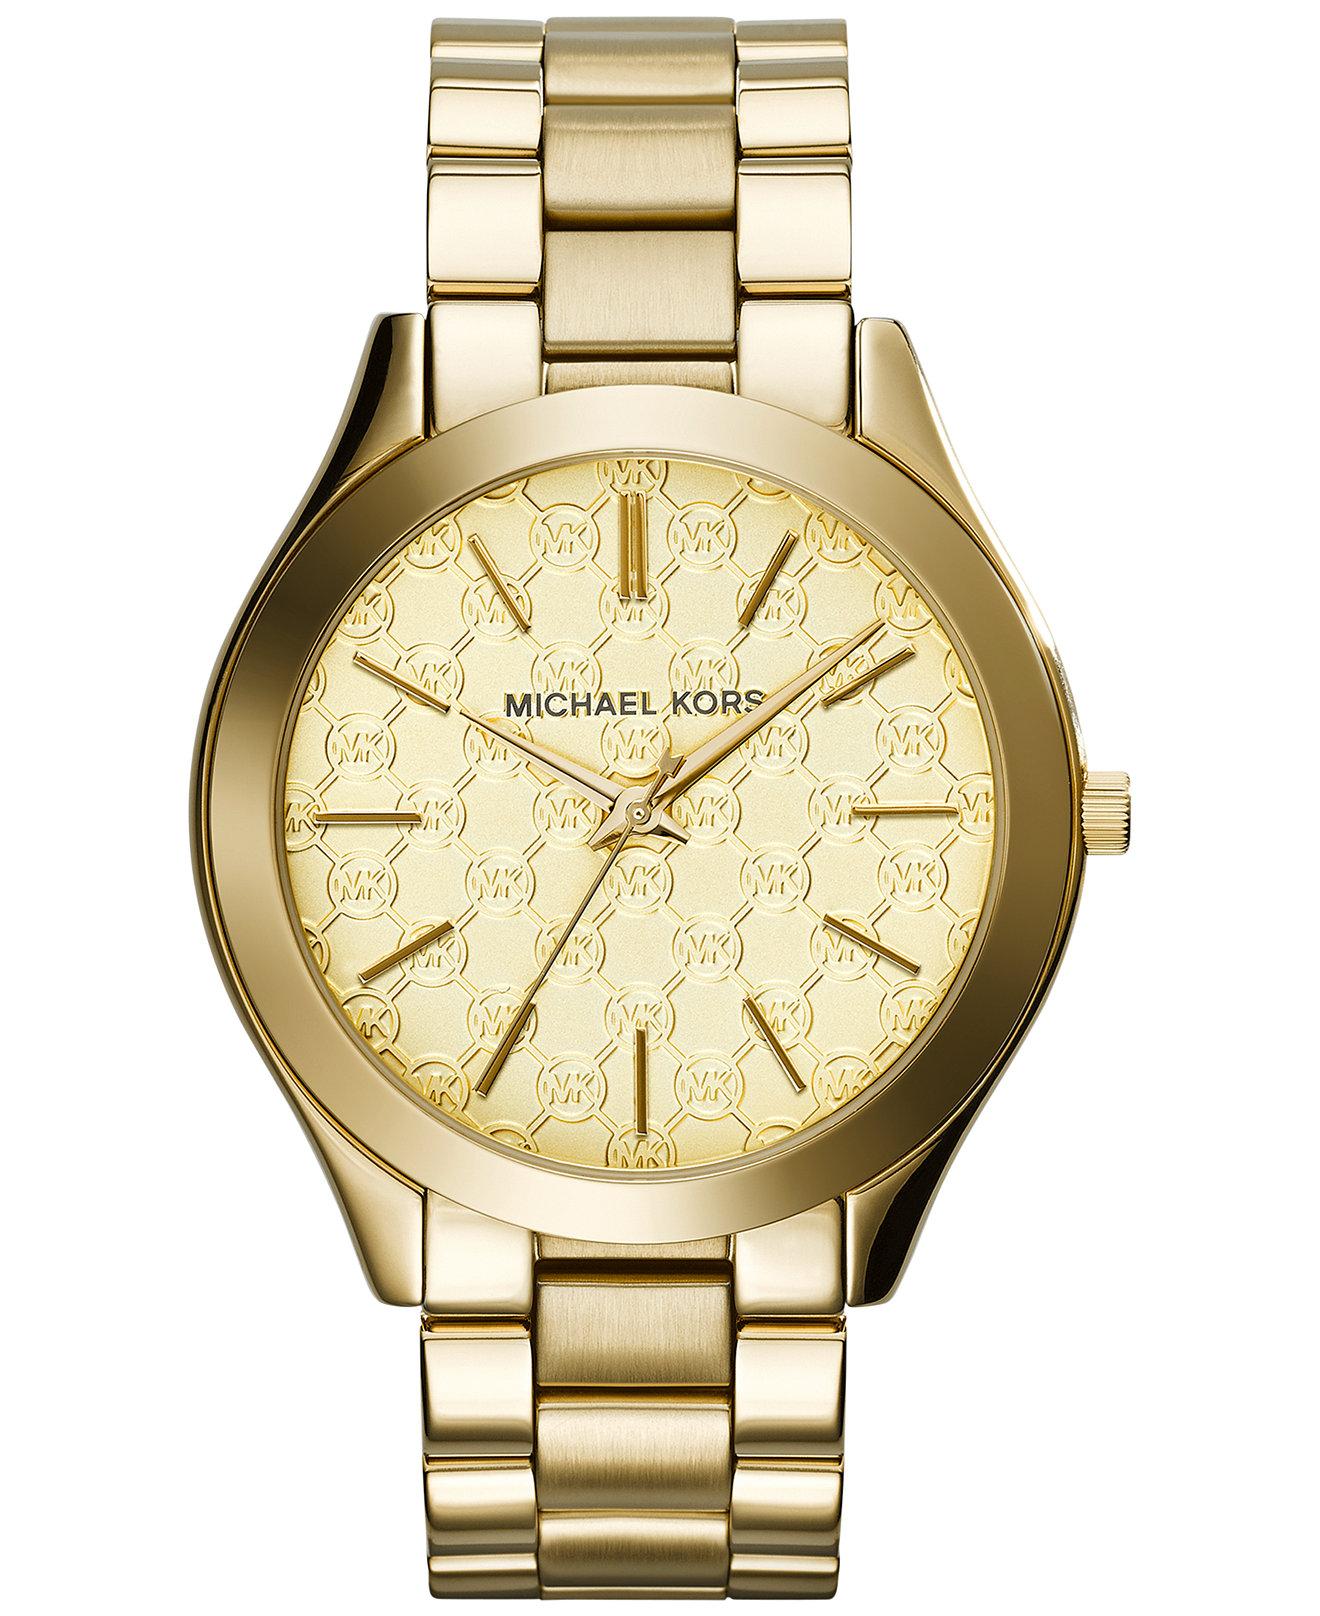 michael kors mk3335 ladies gold tone bracelet watch. Black Bedroom Furniture Sets. Home Design Ideas